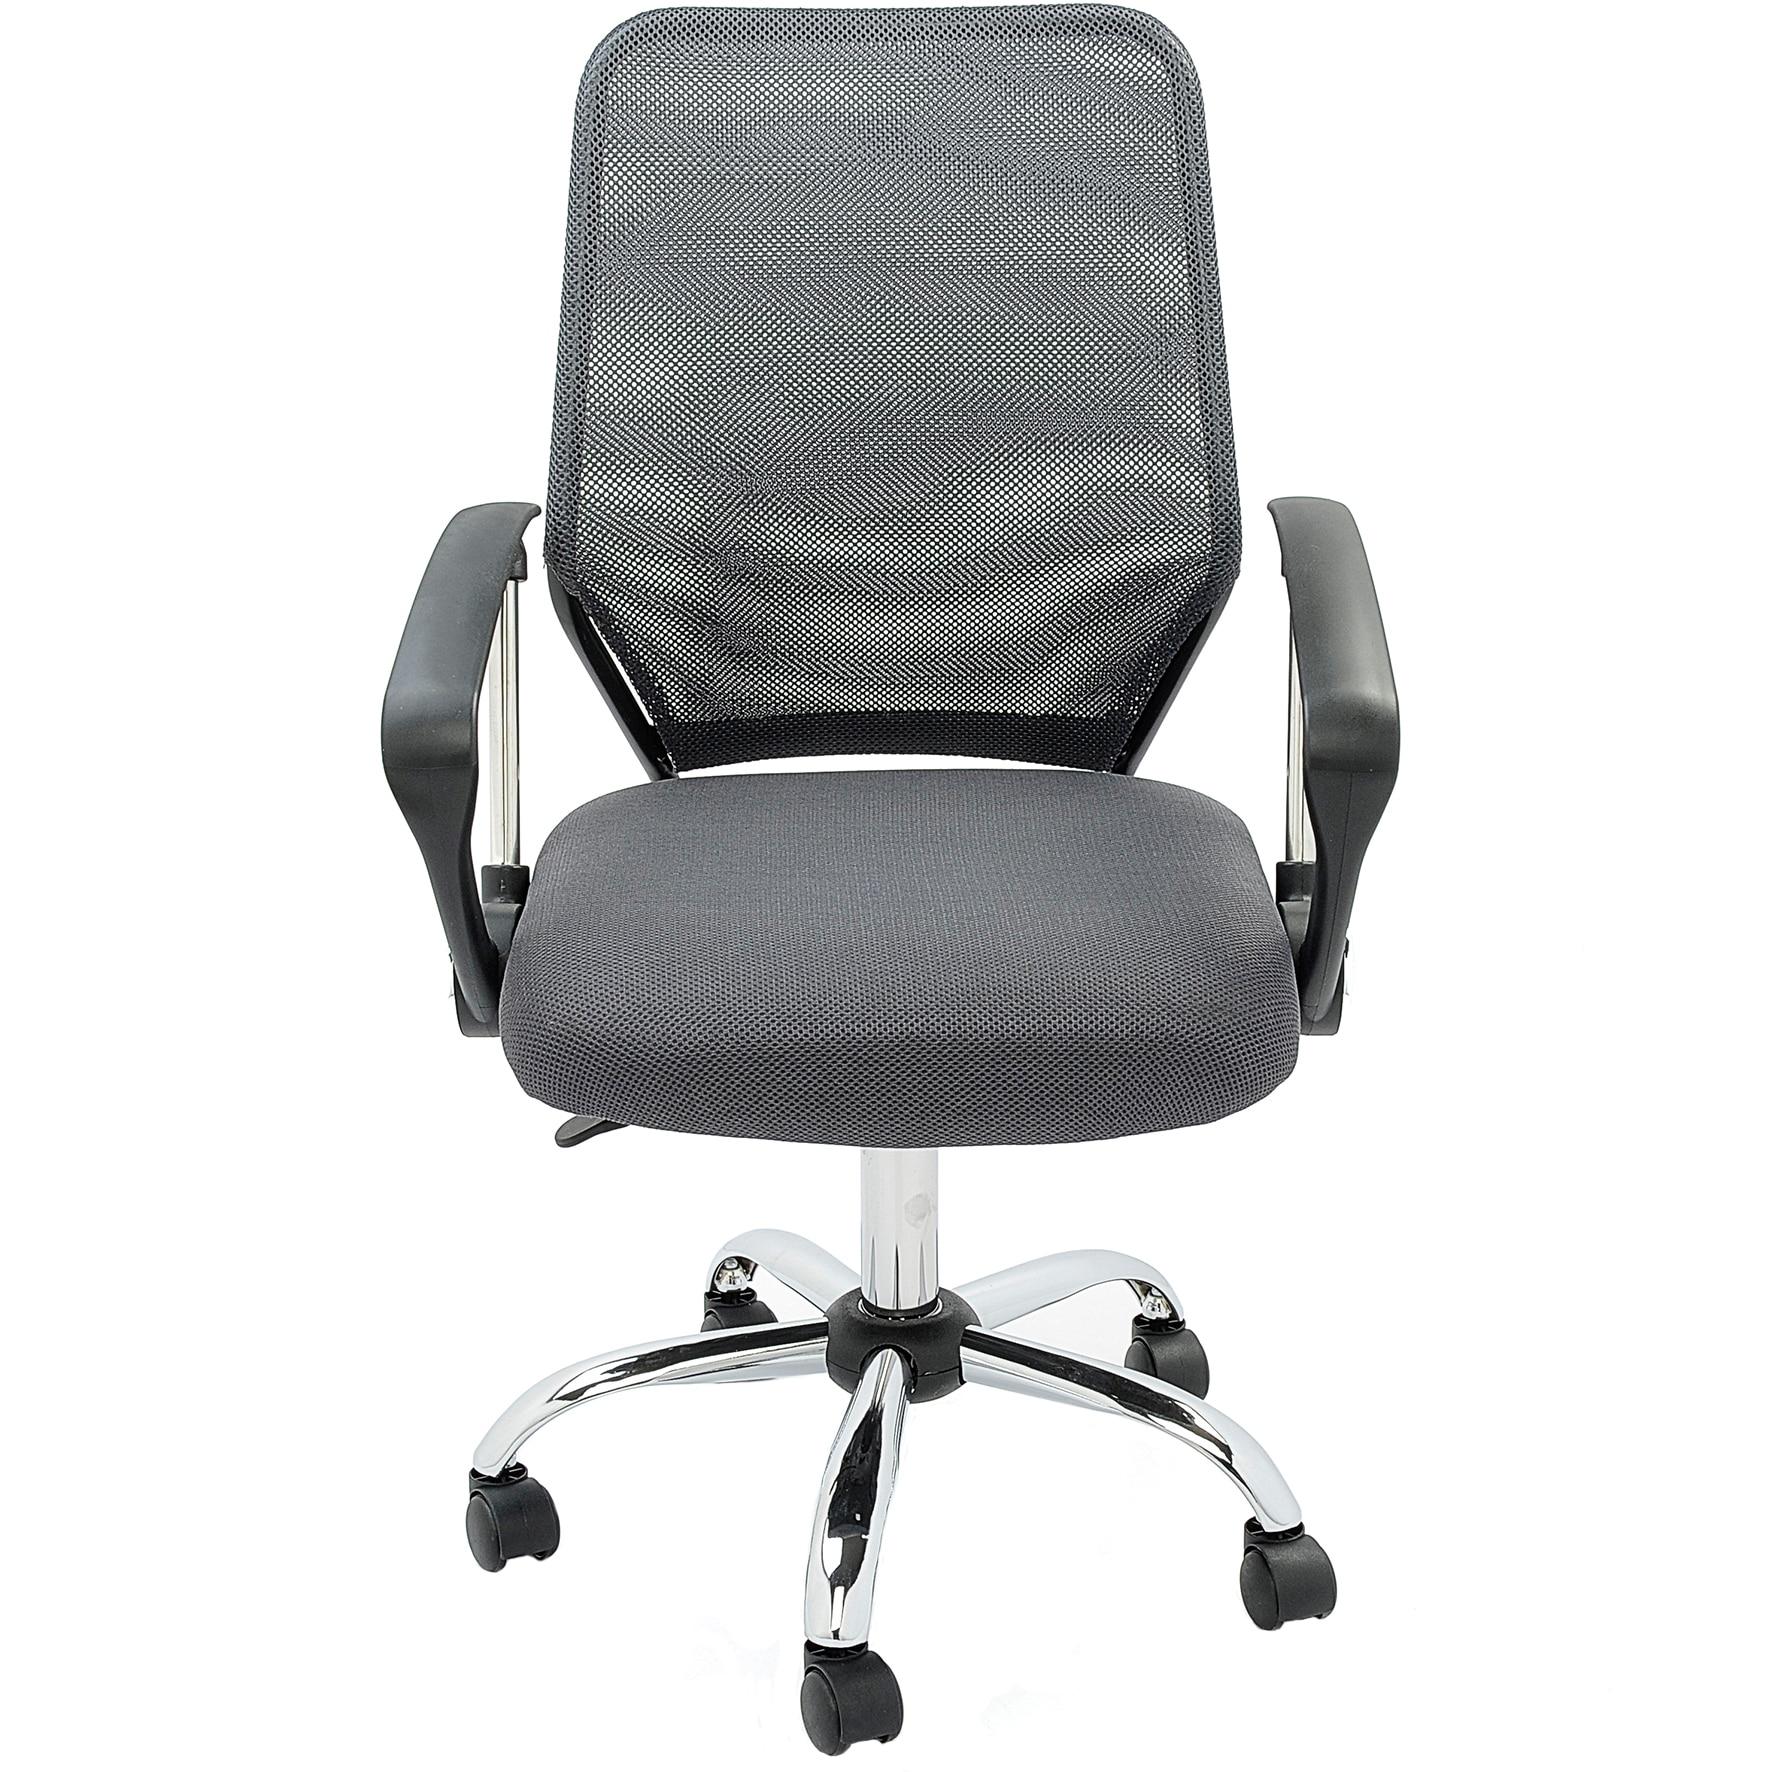 Kring New Fit Ergonomikus szék, Hálós+PU, Fekete eMAG.hu